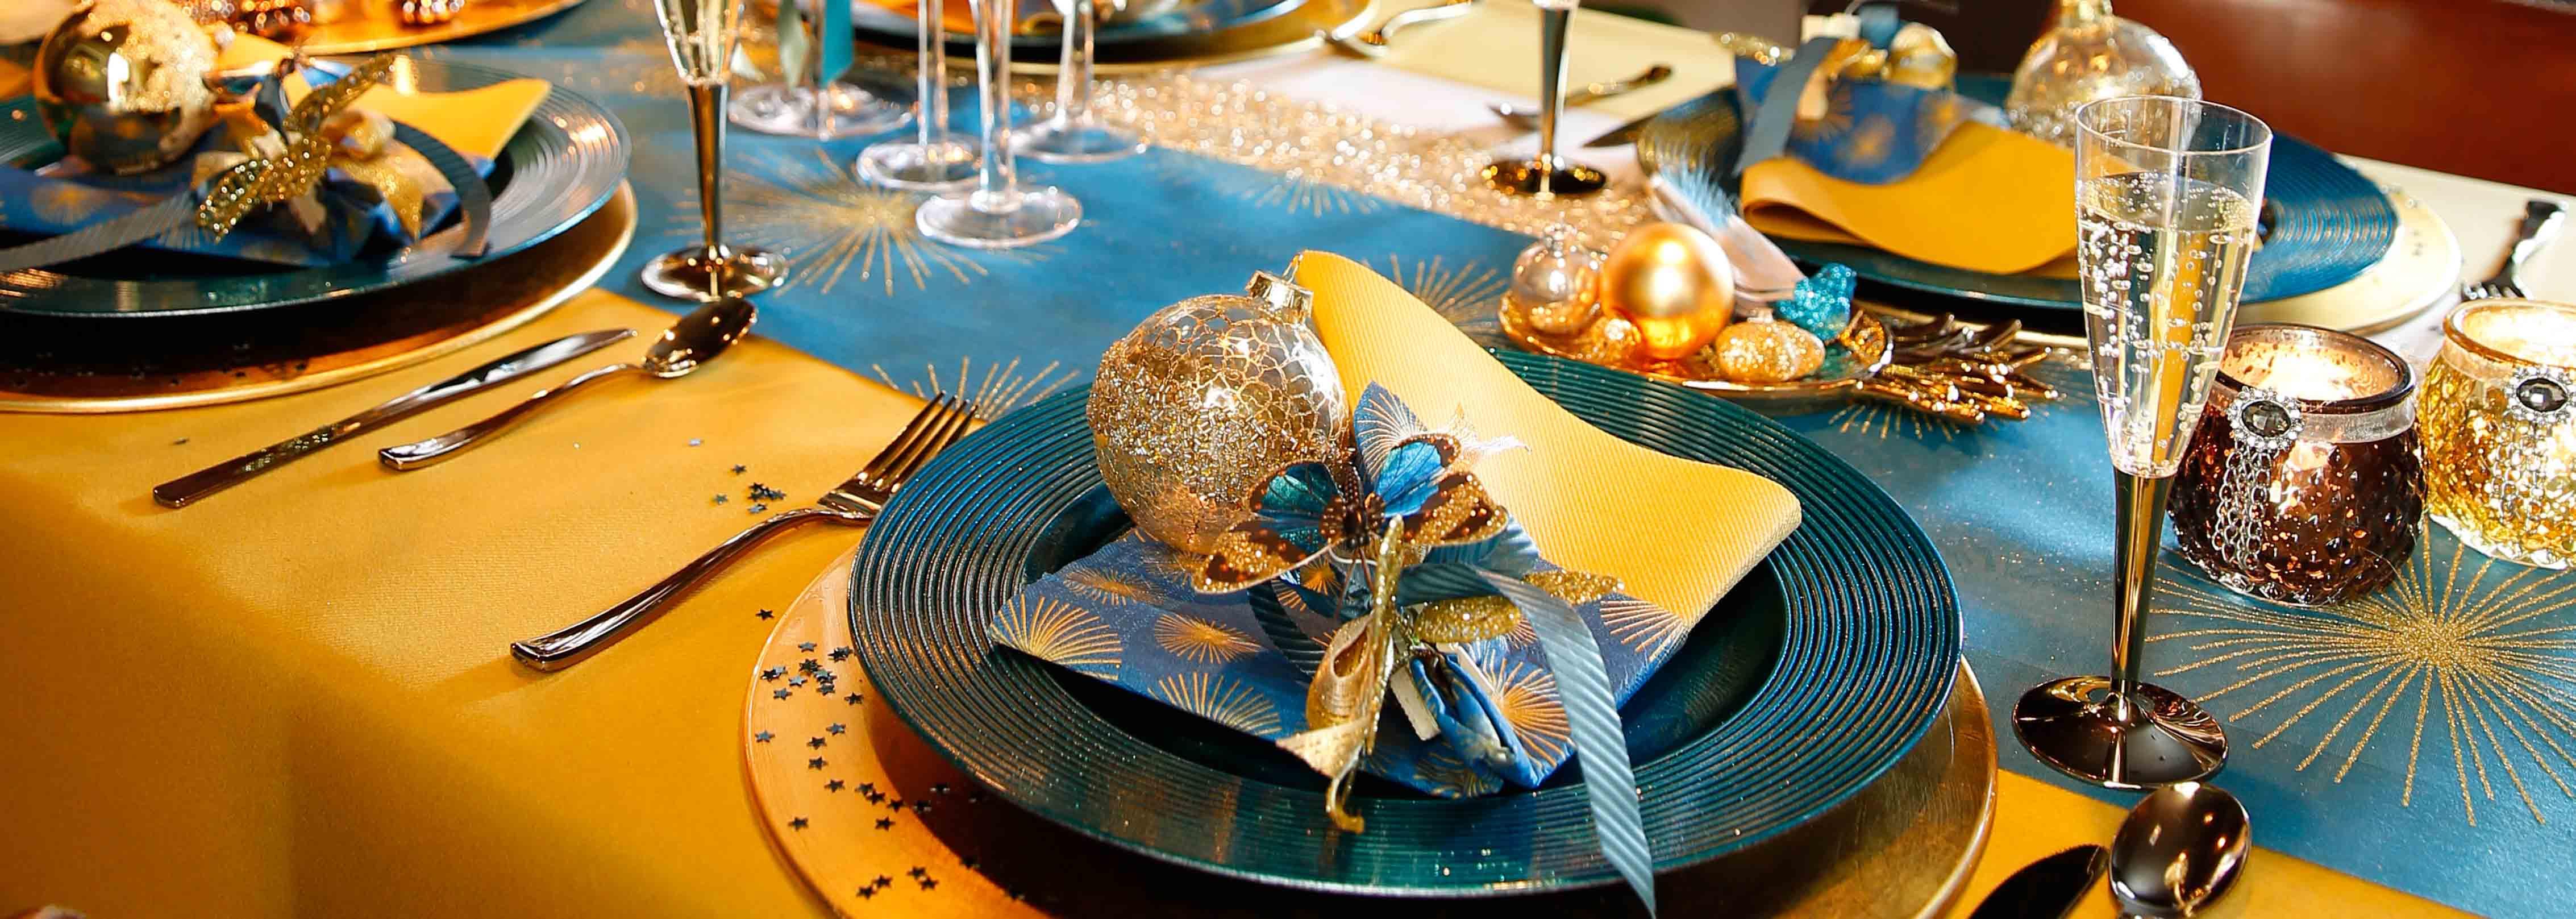 kerst tafelbekleding